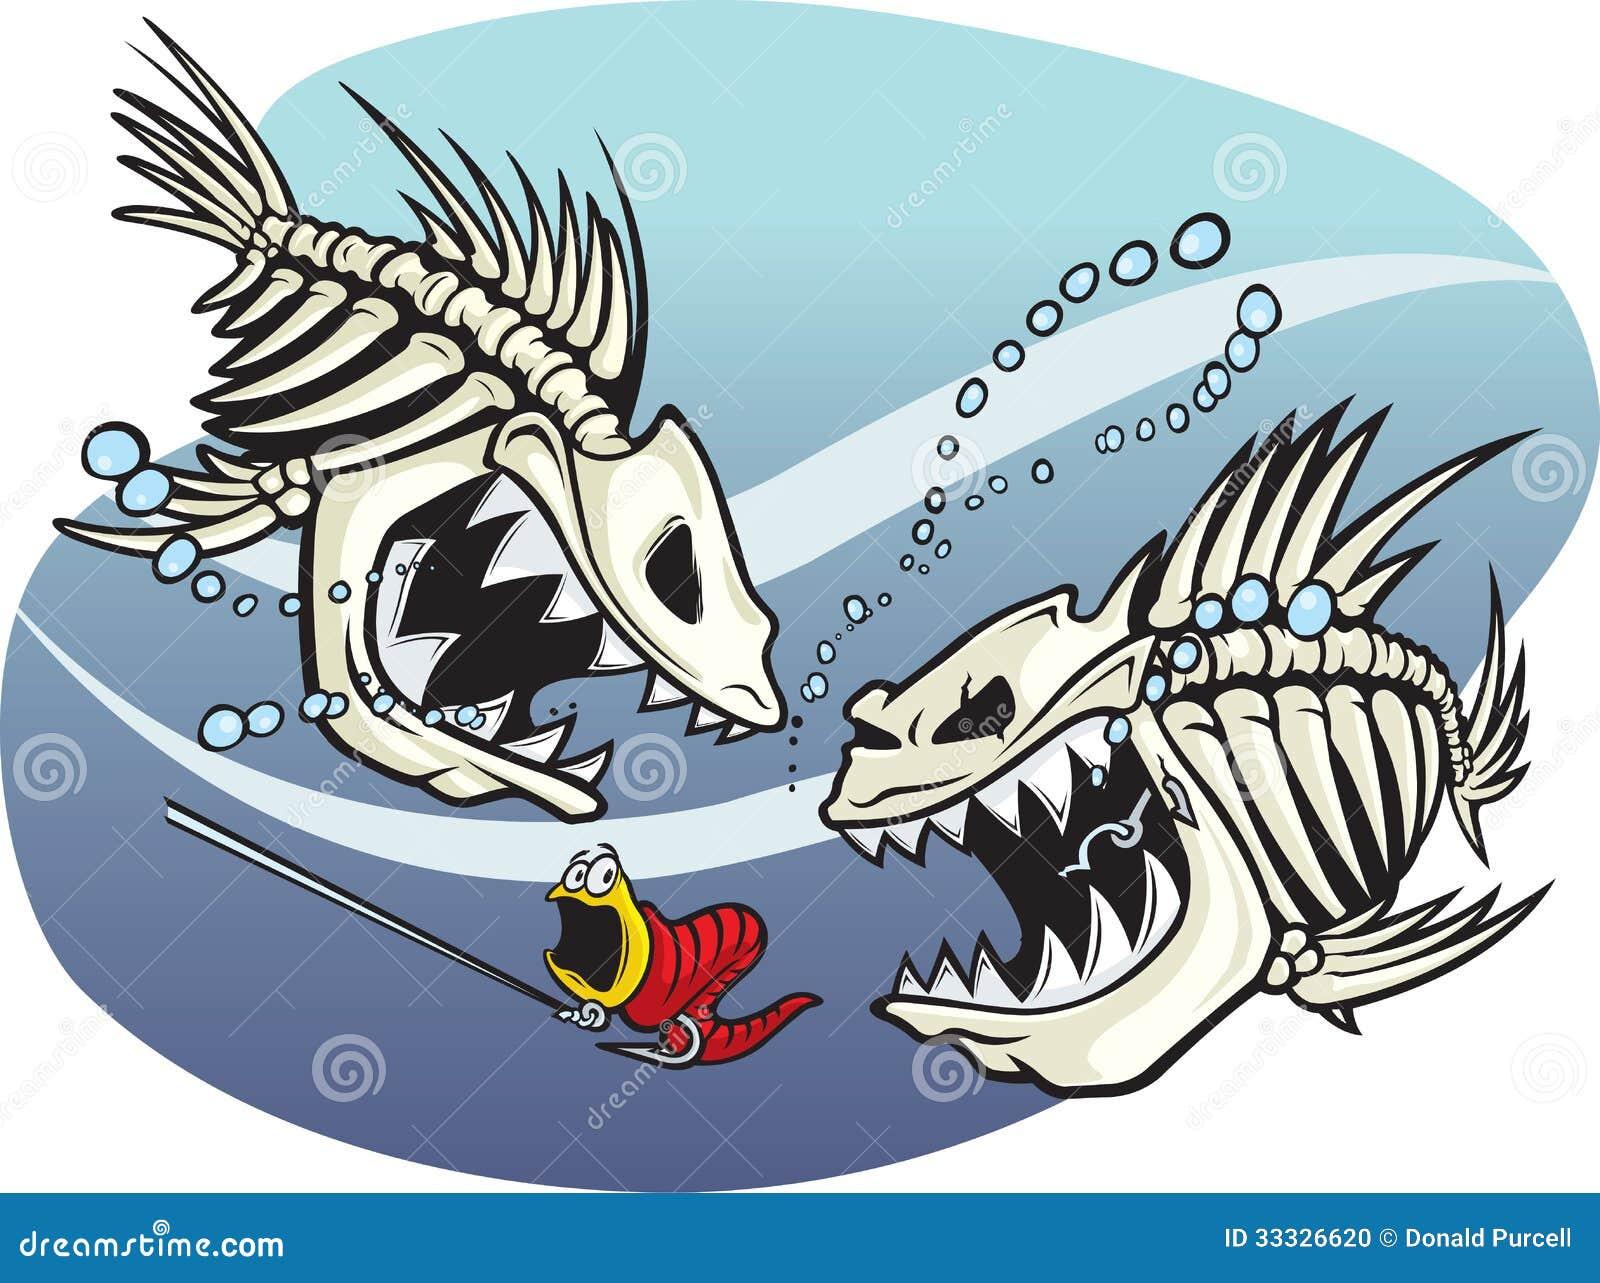 skelefish stock photo